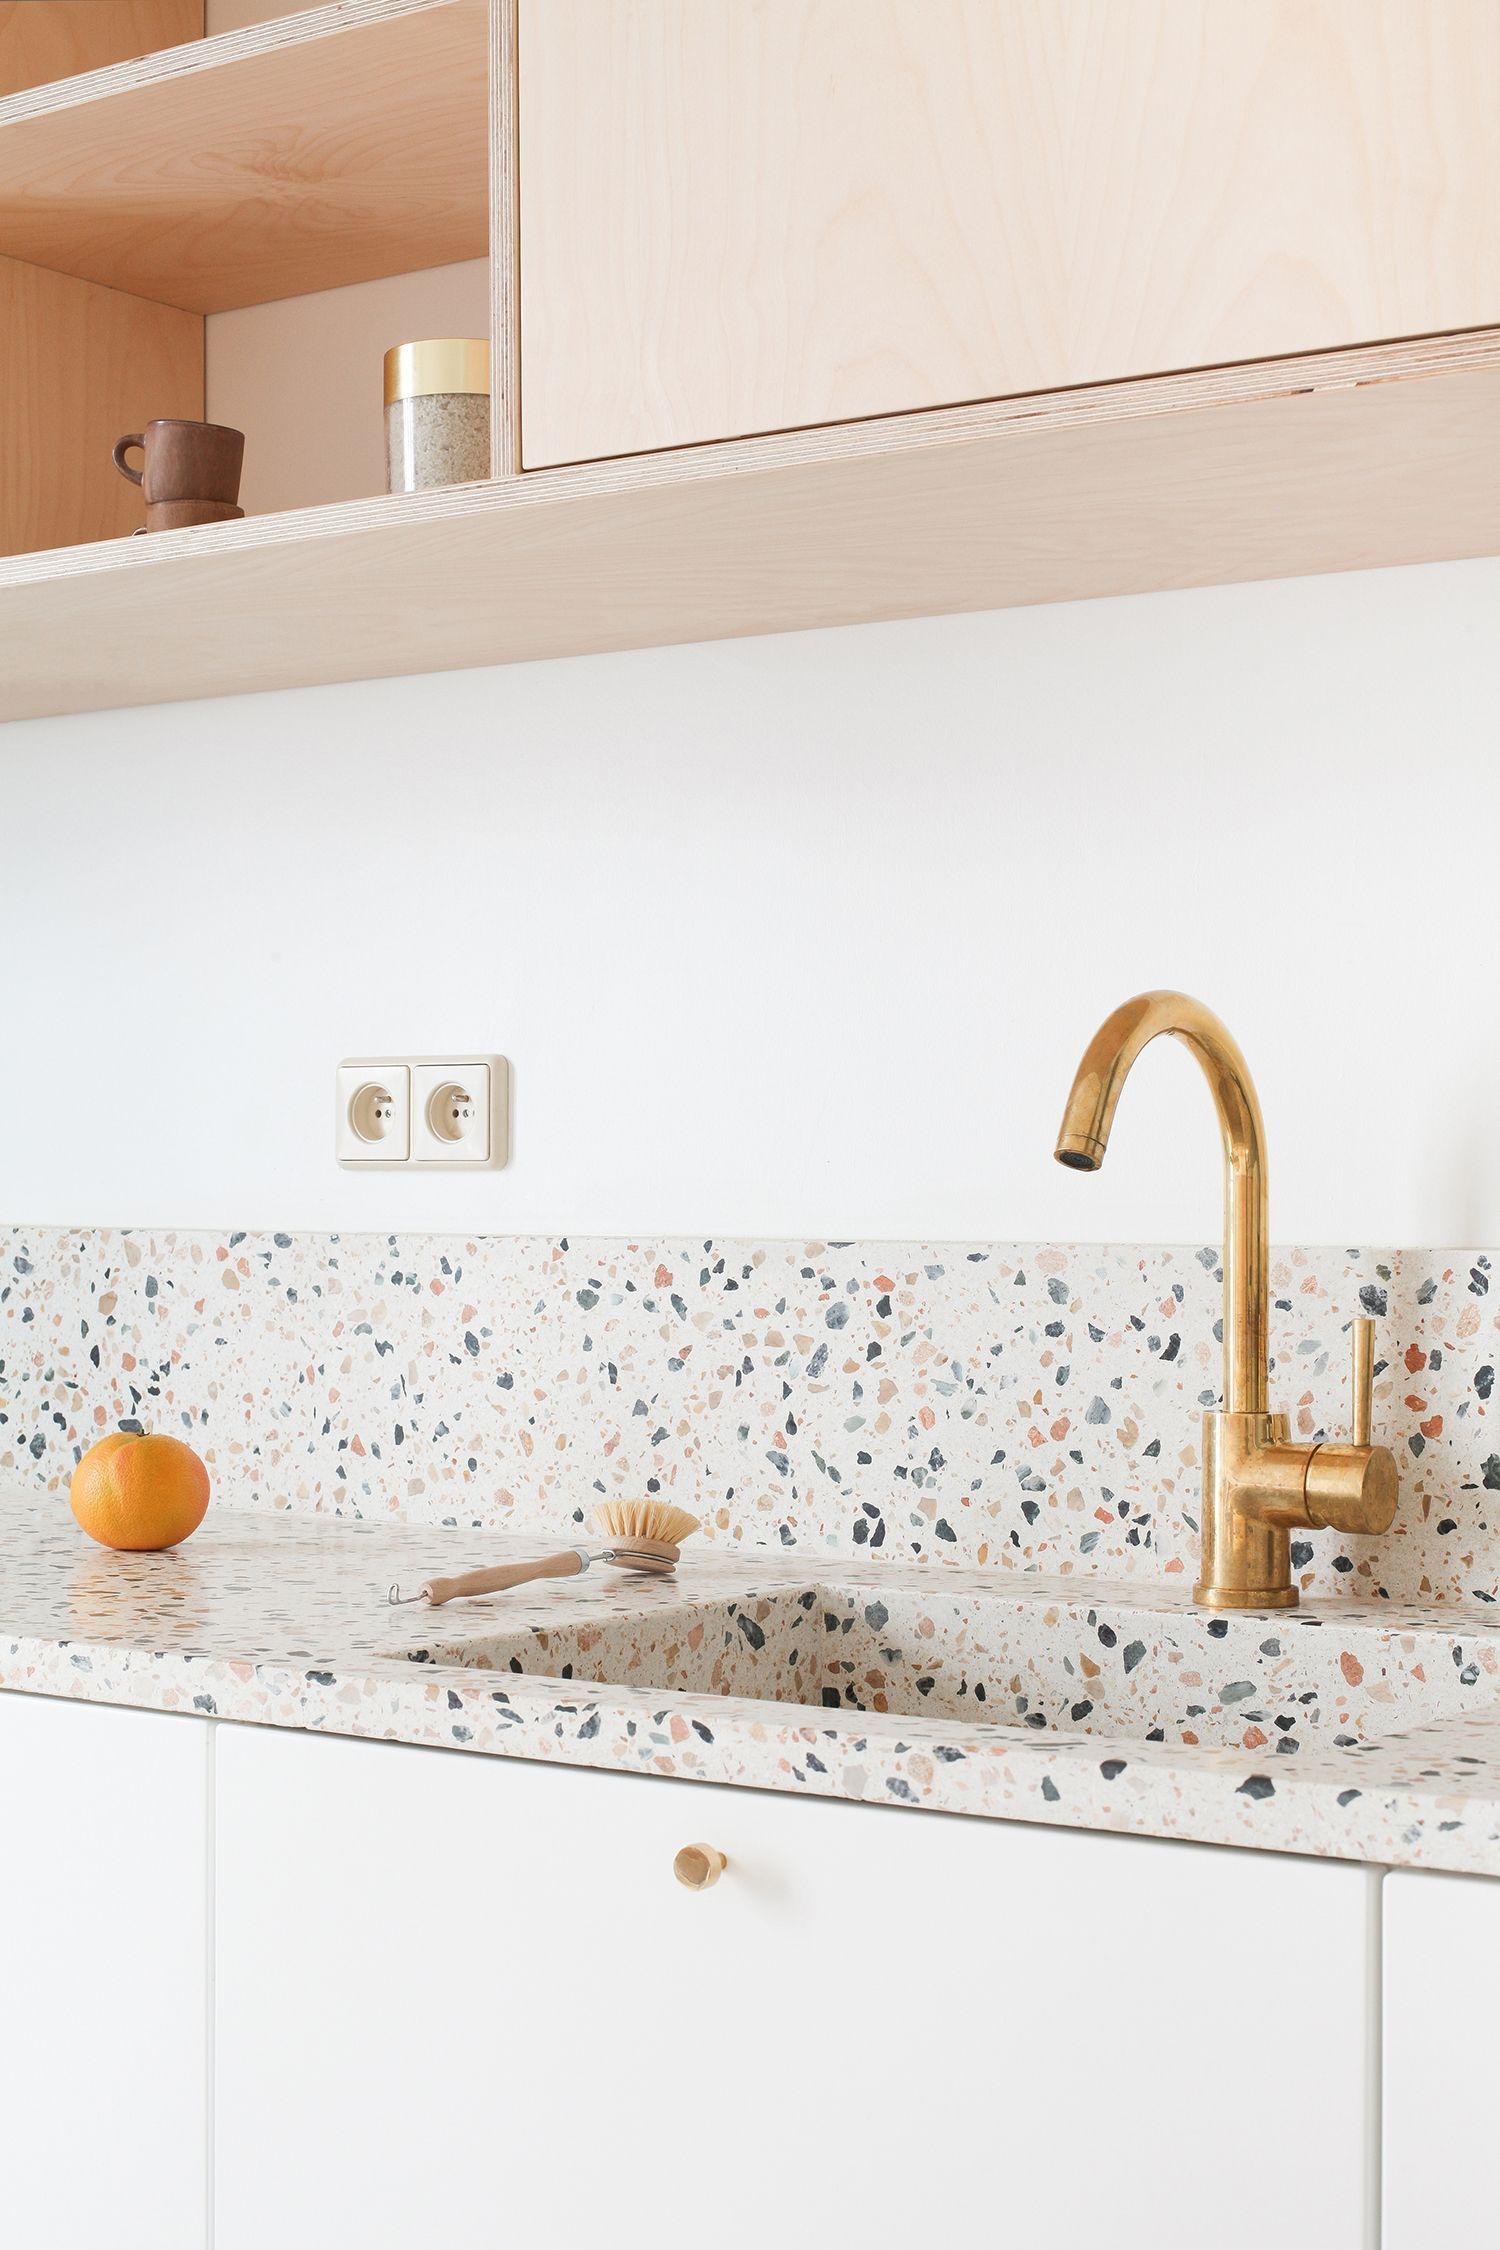 Terrazzo Trend is Making a Comeback in 2018 Kitchen